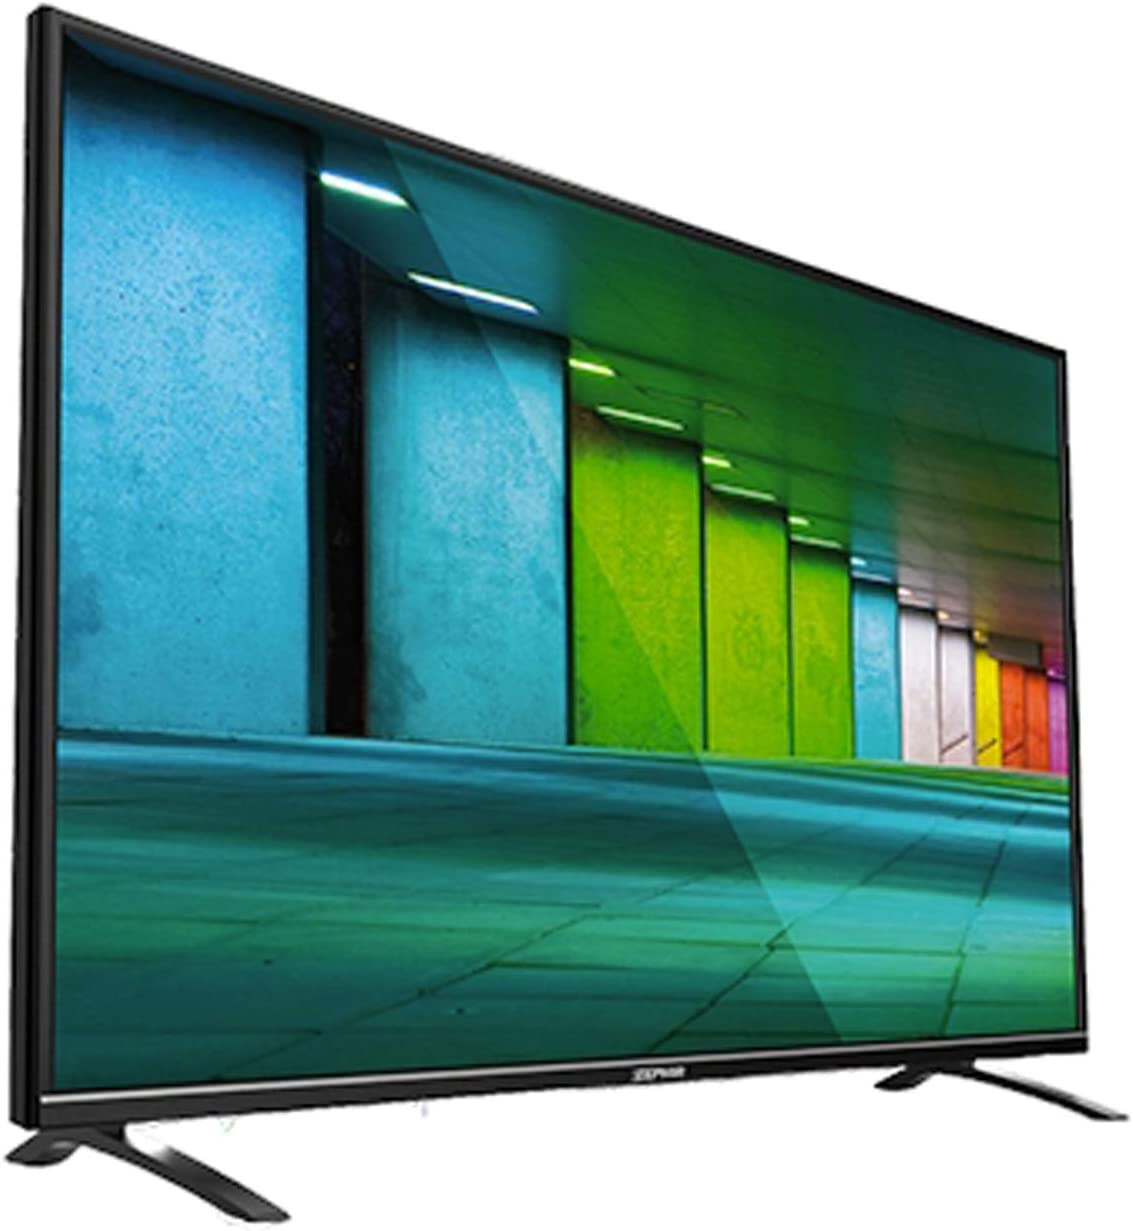 Smart TV 24 pulgadas Televisor ZEPHIR LED Full HD Android TV HDMI USB: Amazon.es: Electrónica